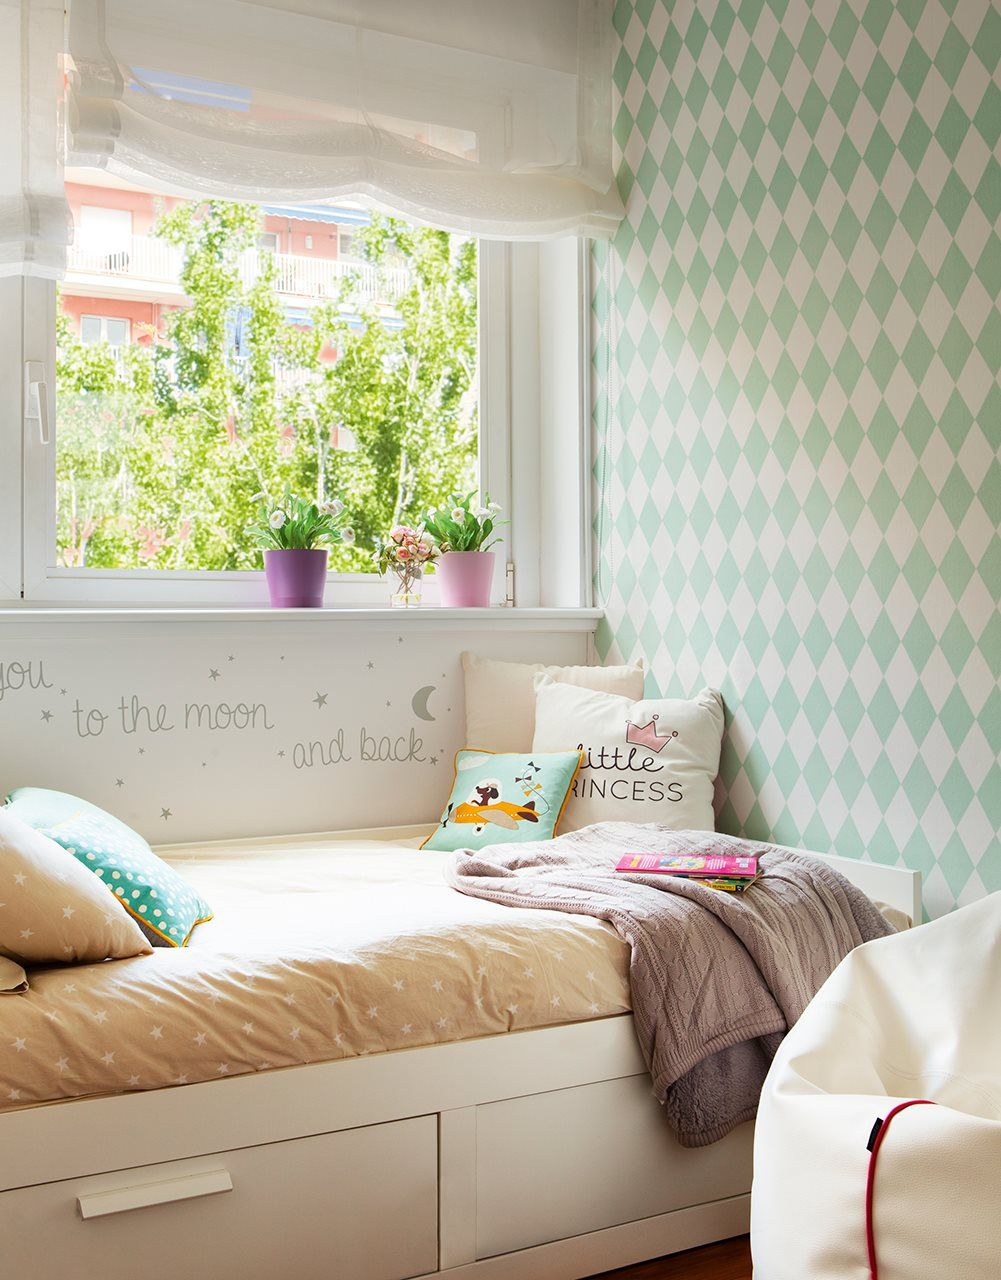 El Papel De La Pared Papel Pintado Habitacion Infantil  ~ Pintura Para Habitaciones Infantiles